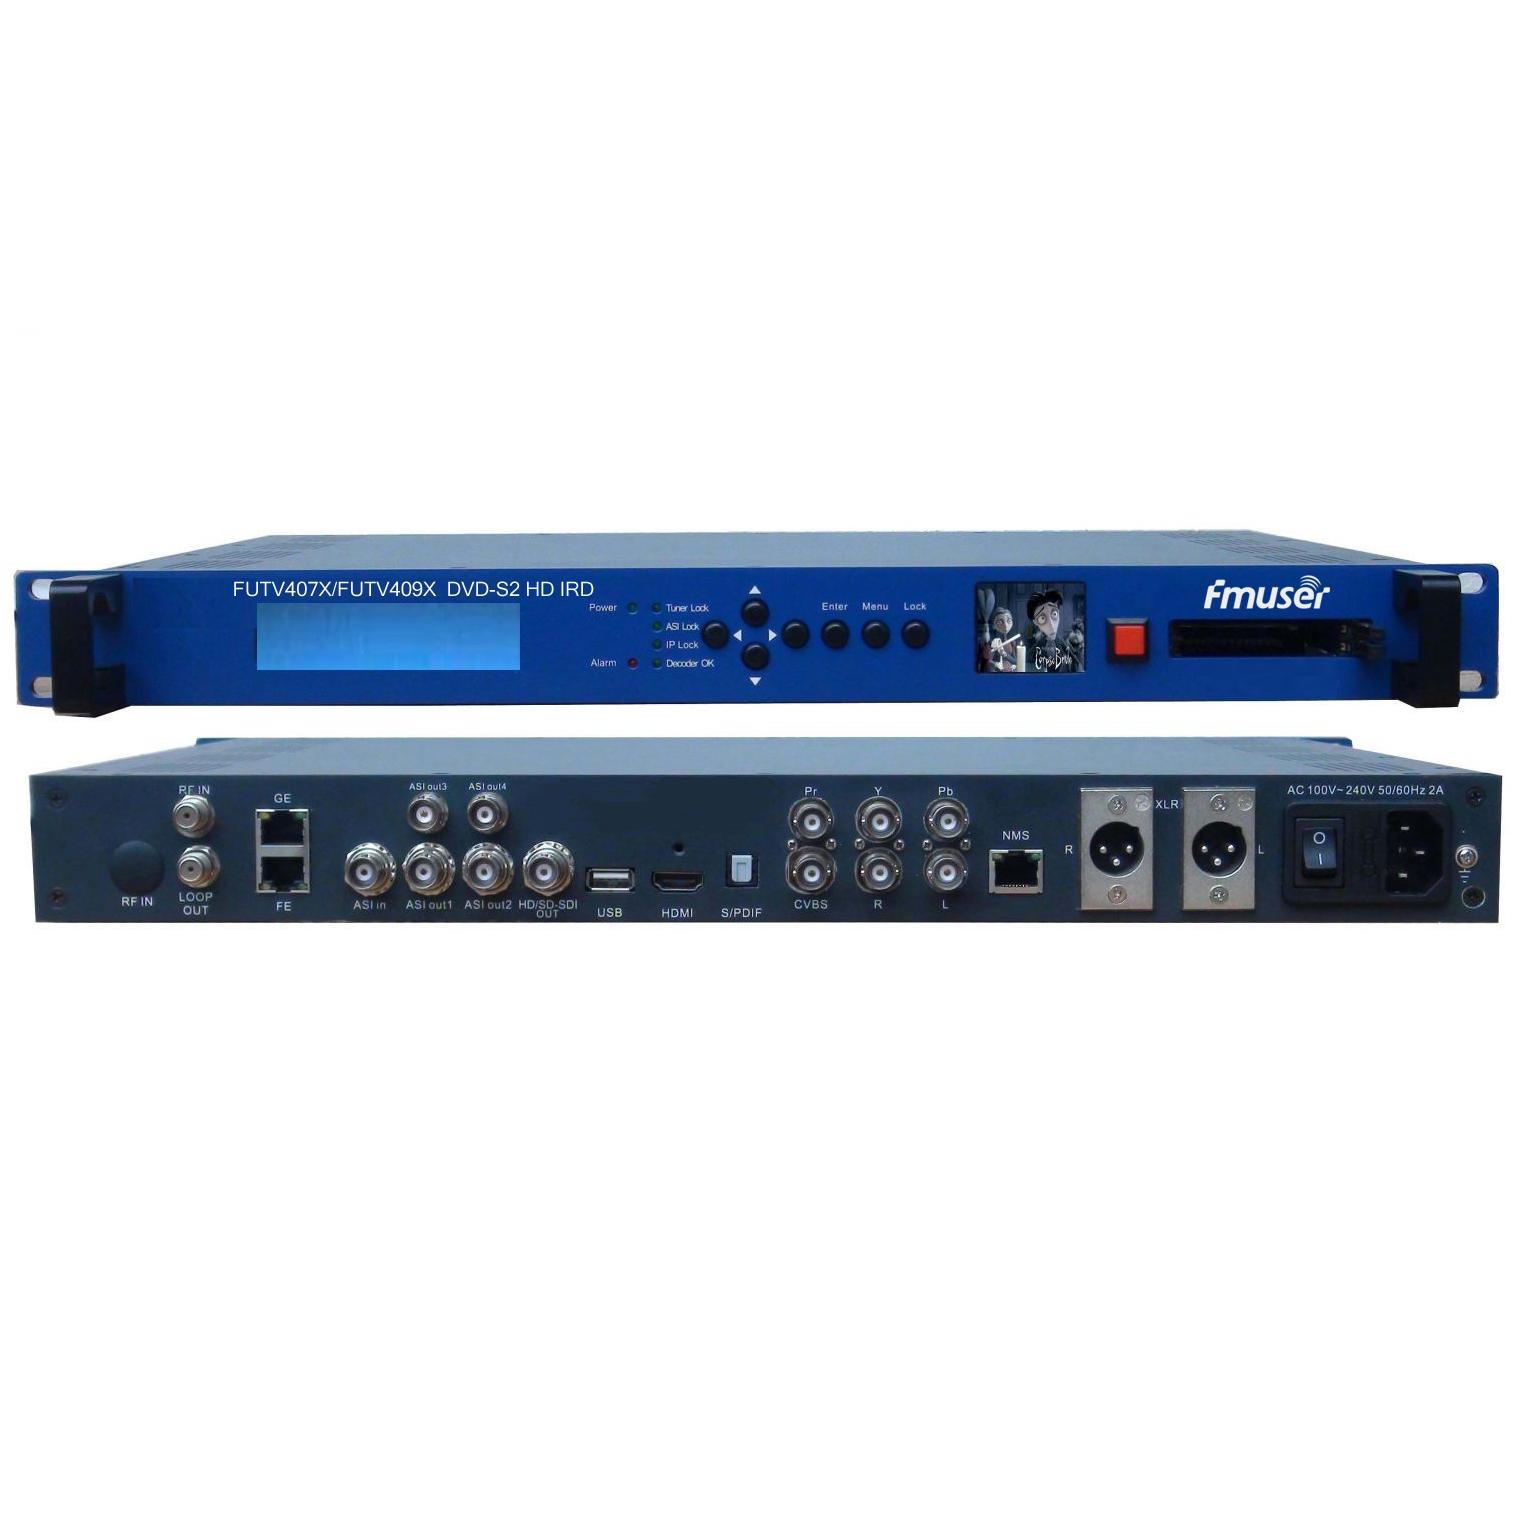 FMUSER FUTV409X / FUTV407X CAM IRD(1 DVB-C / T / S / S2,DMB-T,ISDB-T,ATSC-T 8VSB RF输入,1 ASI IP输入,2 ASI 1 IP输出,HDMI SDI CVBS XLR输出)带实时屏幕